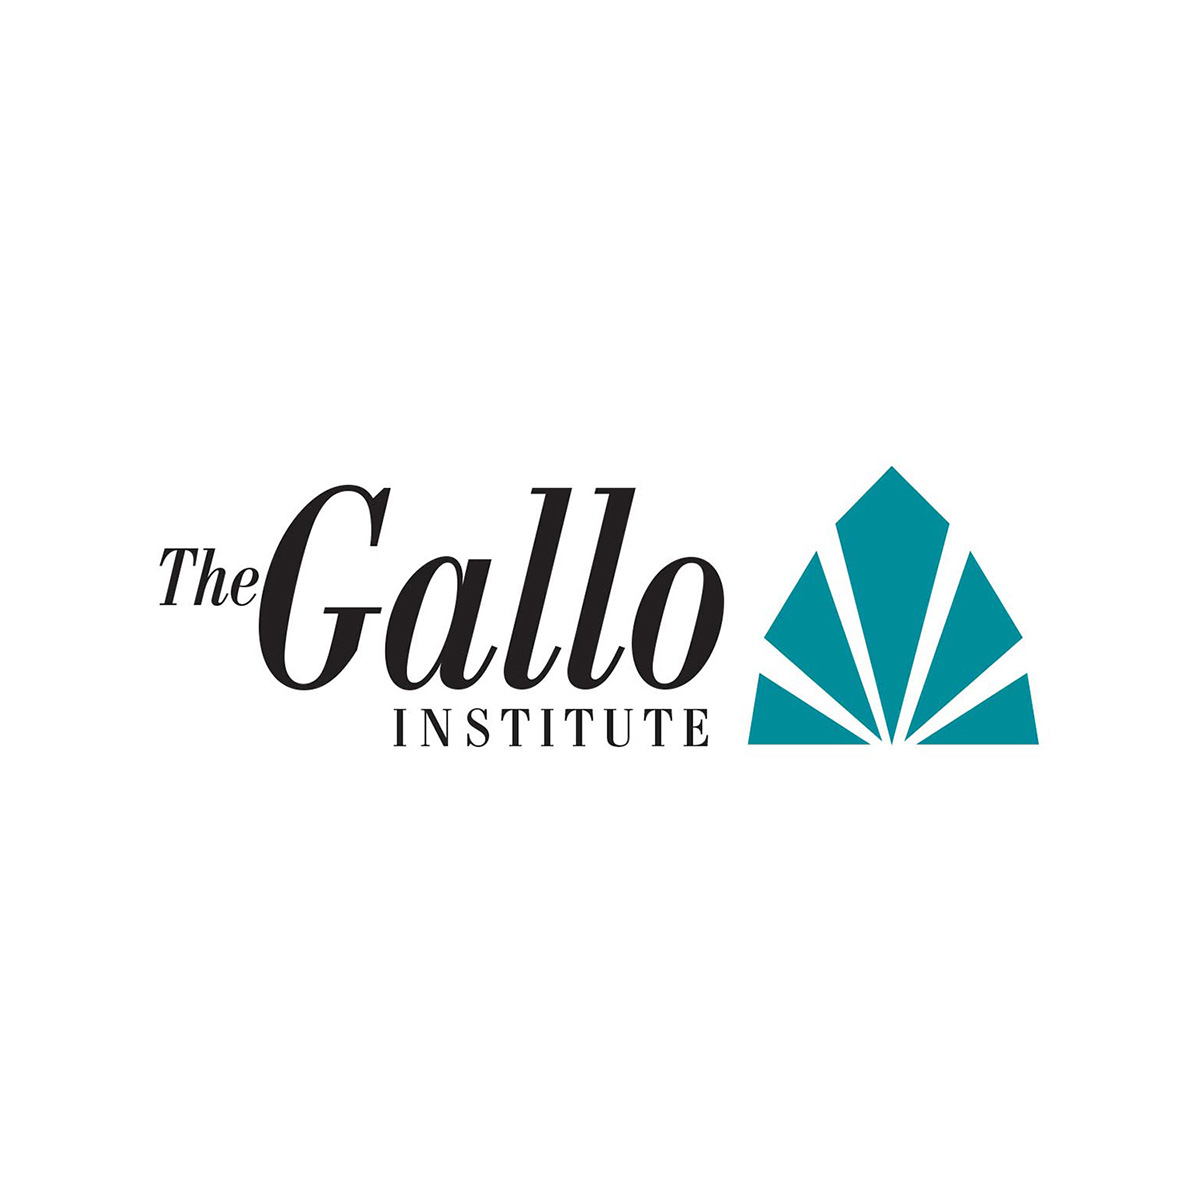 The Gallo Institute